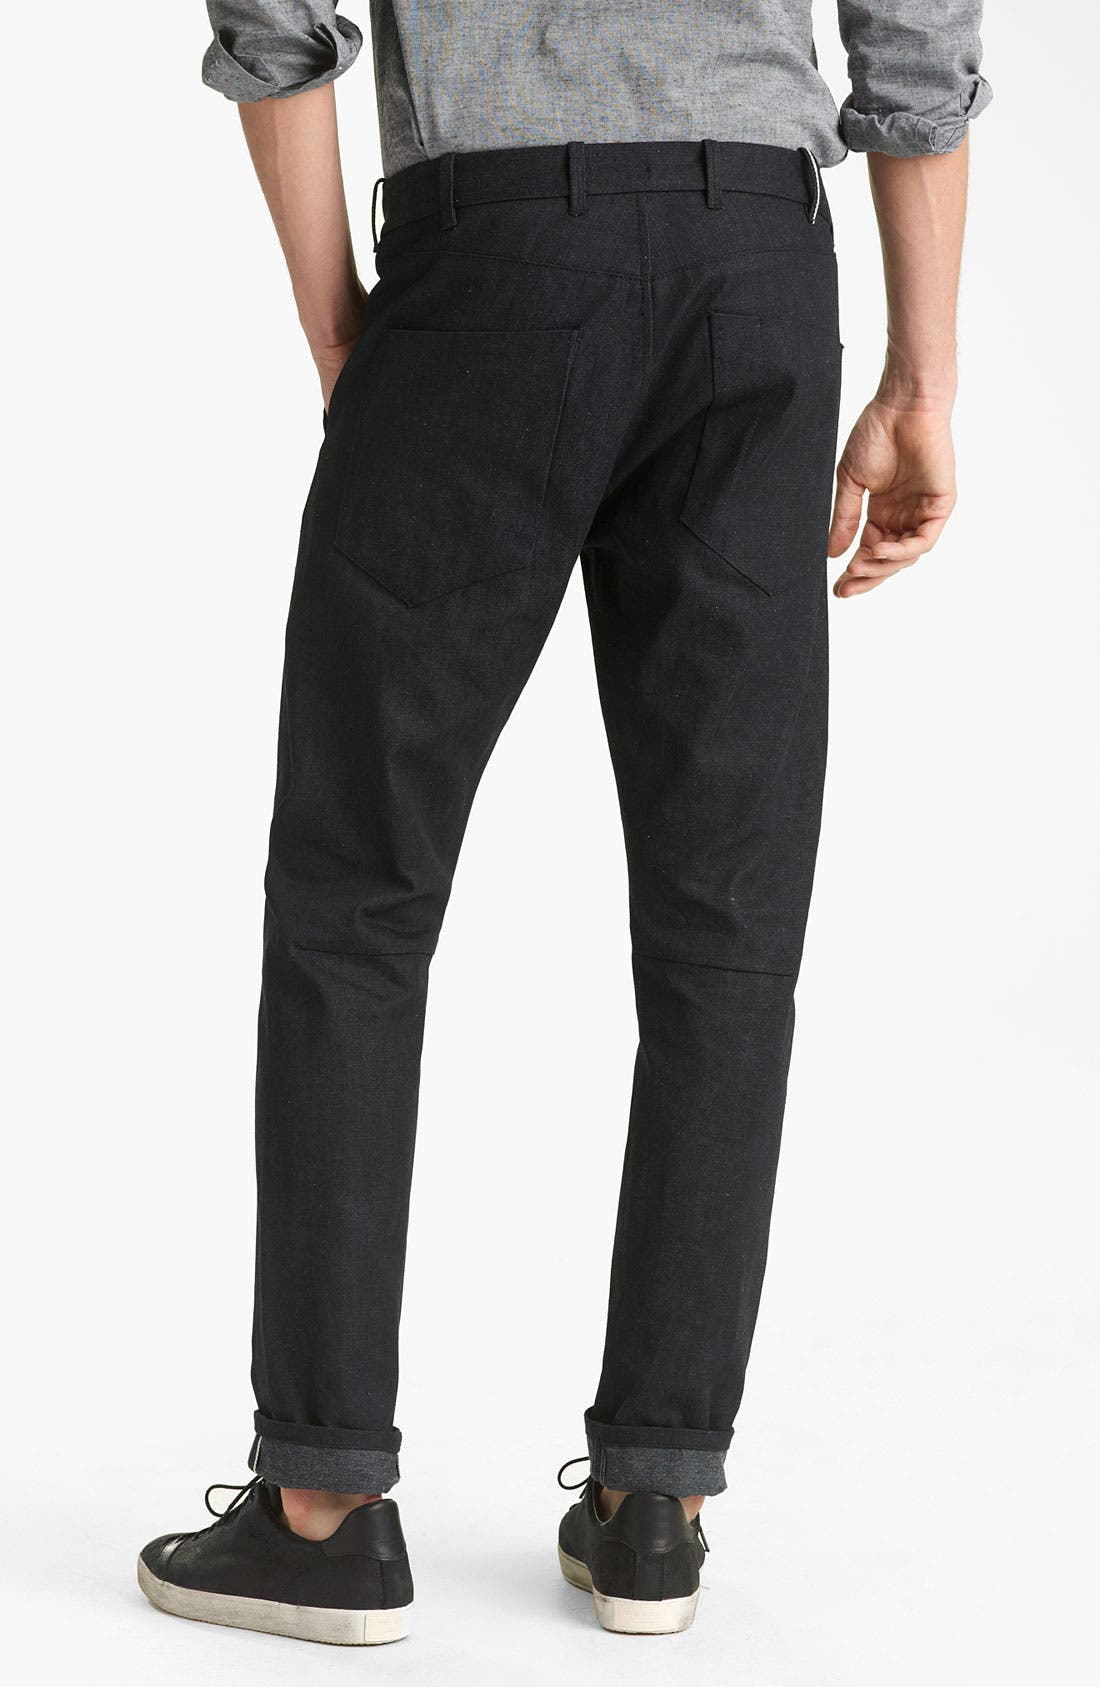 Alternate Image 1 Selected - Rogan 'Tunnel' Tapered Trouser Jeans (Indigo)